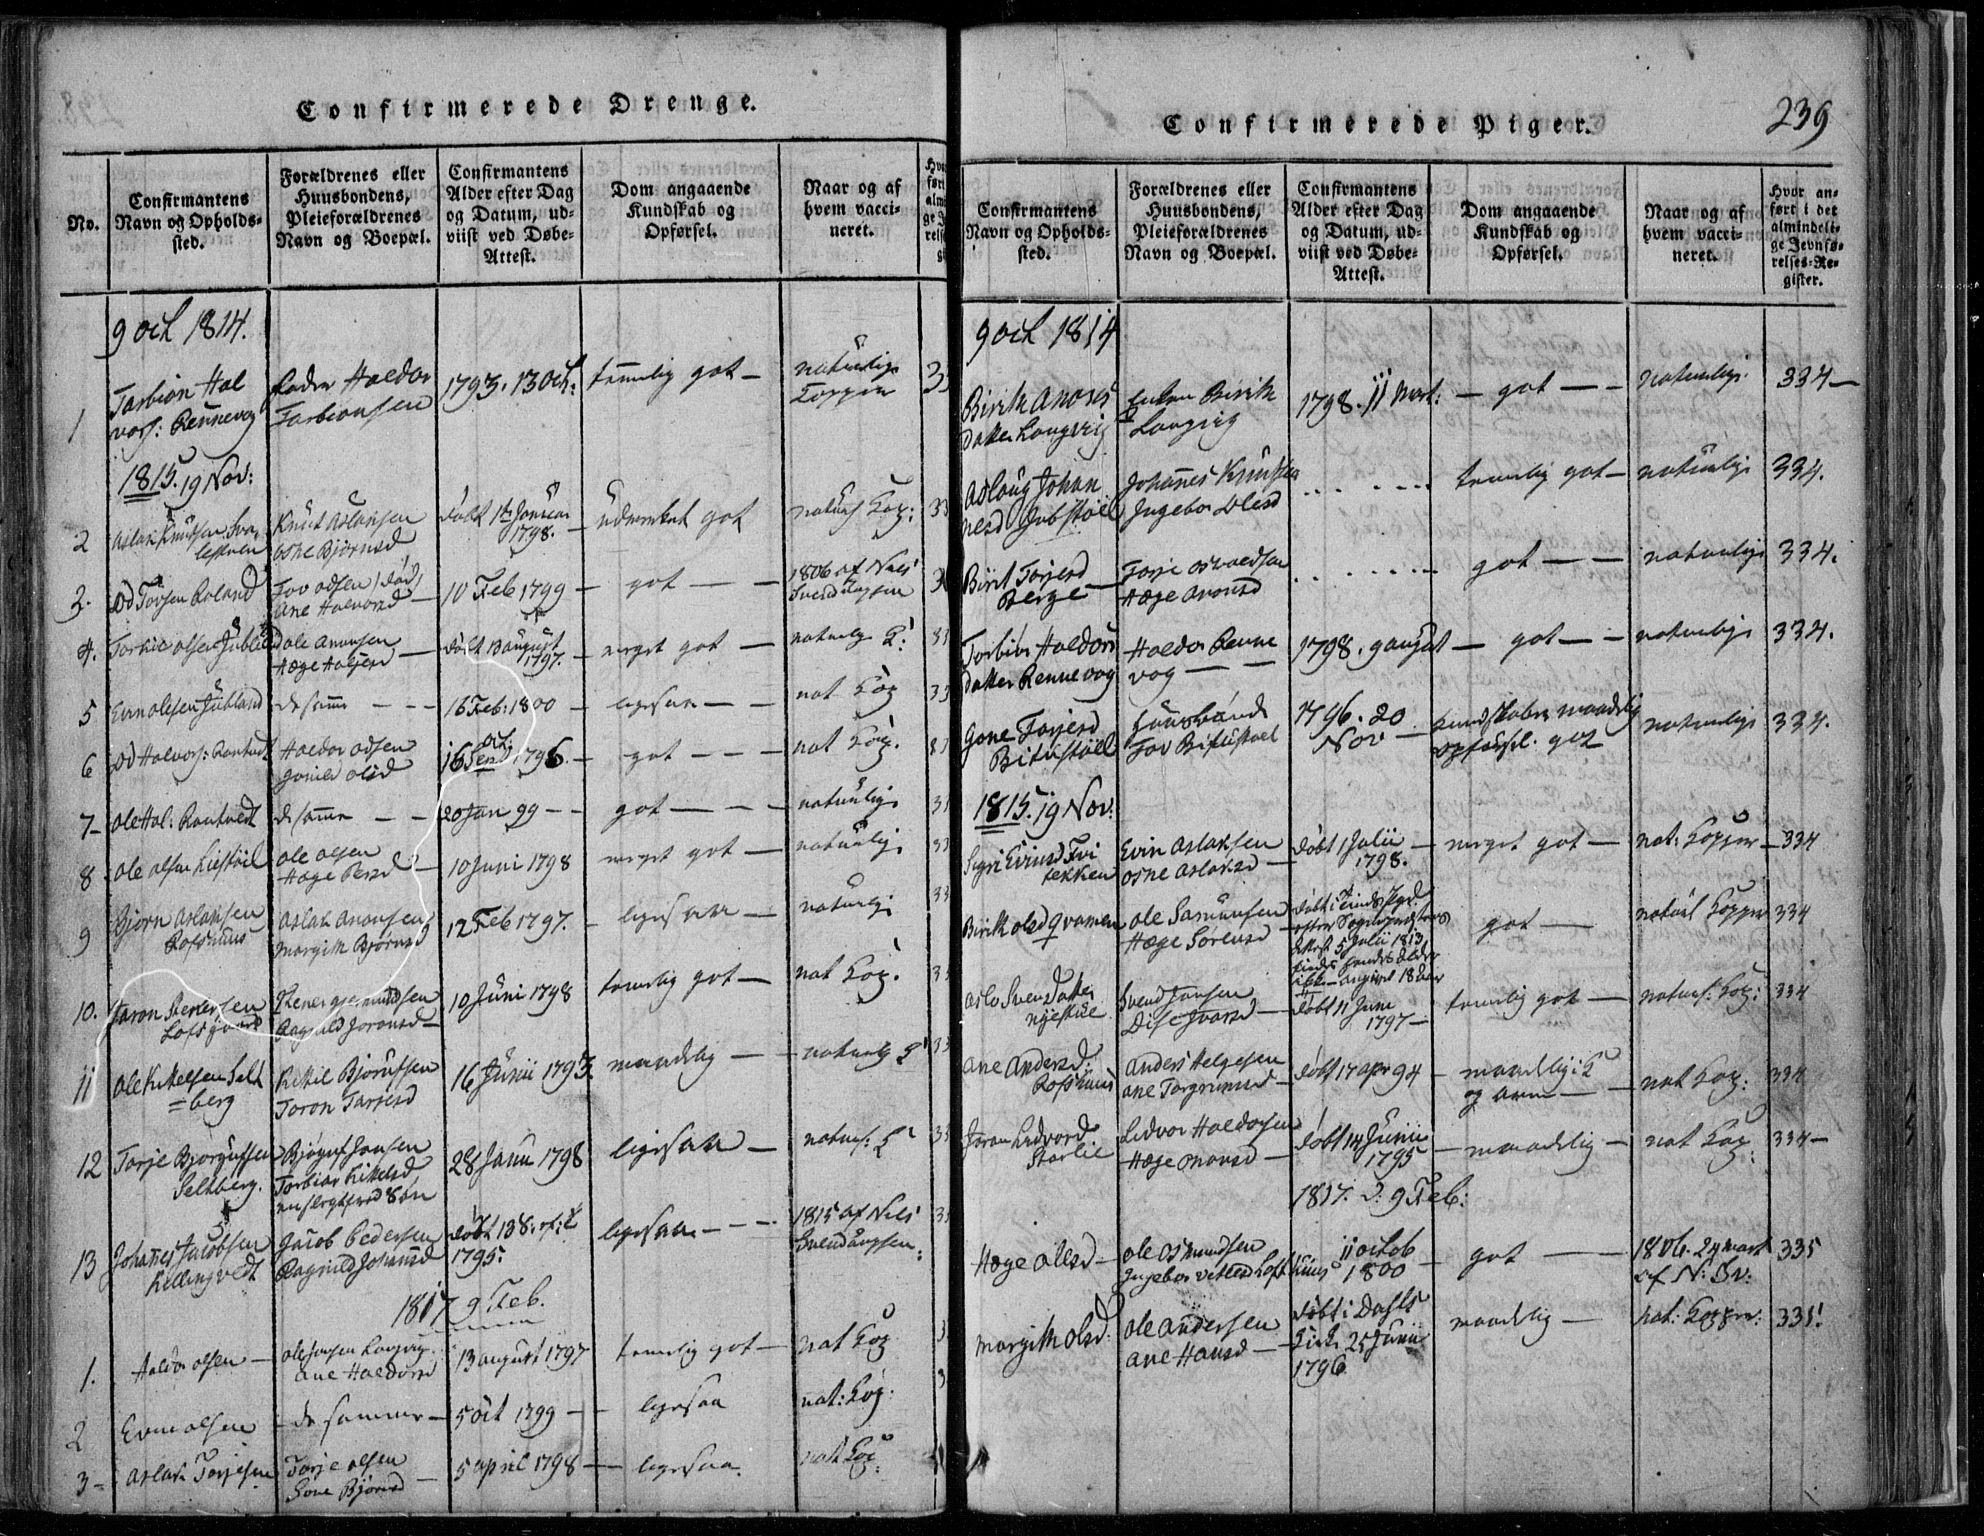 SAKO, Rauland kirkebøker, F/Fa/L0001: Ministerialbok nr. 1, 1814-1859, s. 239